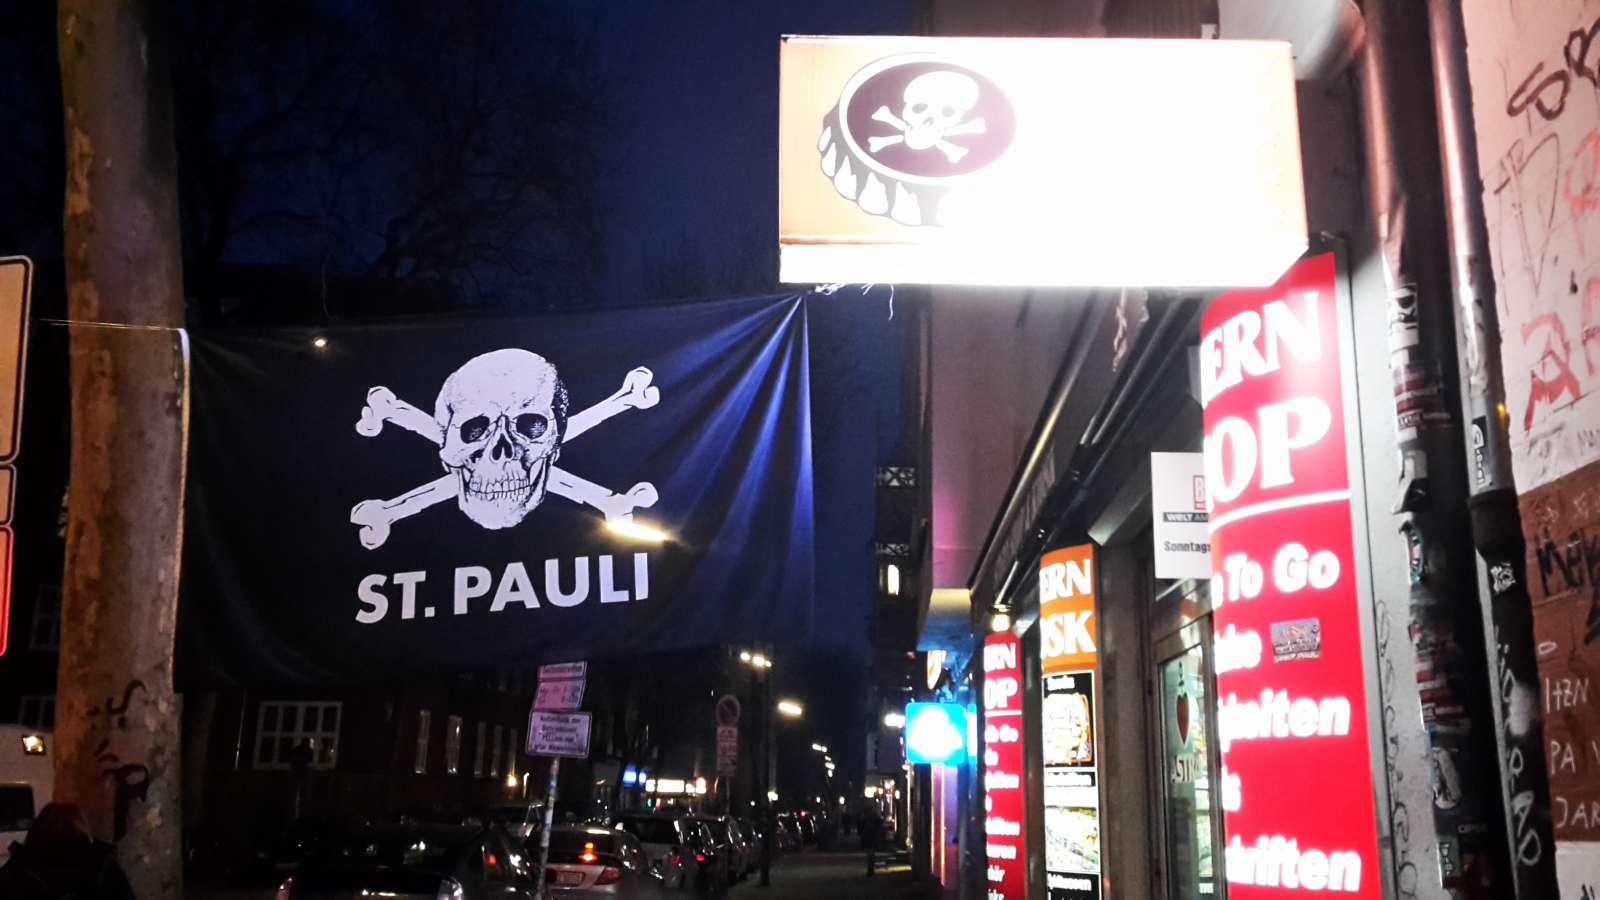 Die St. Pauli-Fahnen prägen den Kiez